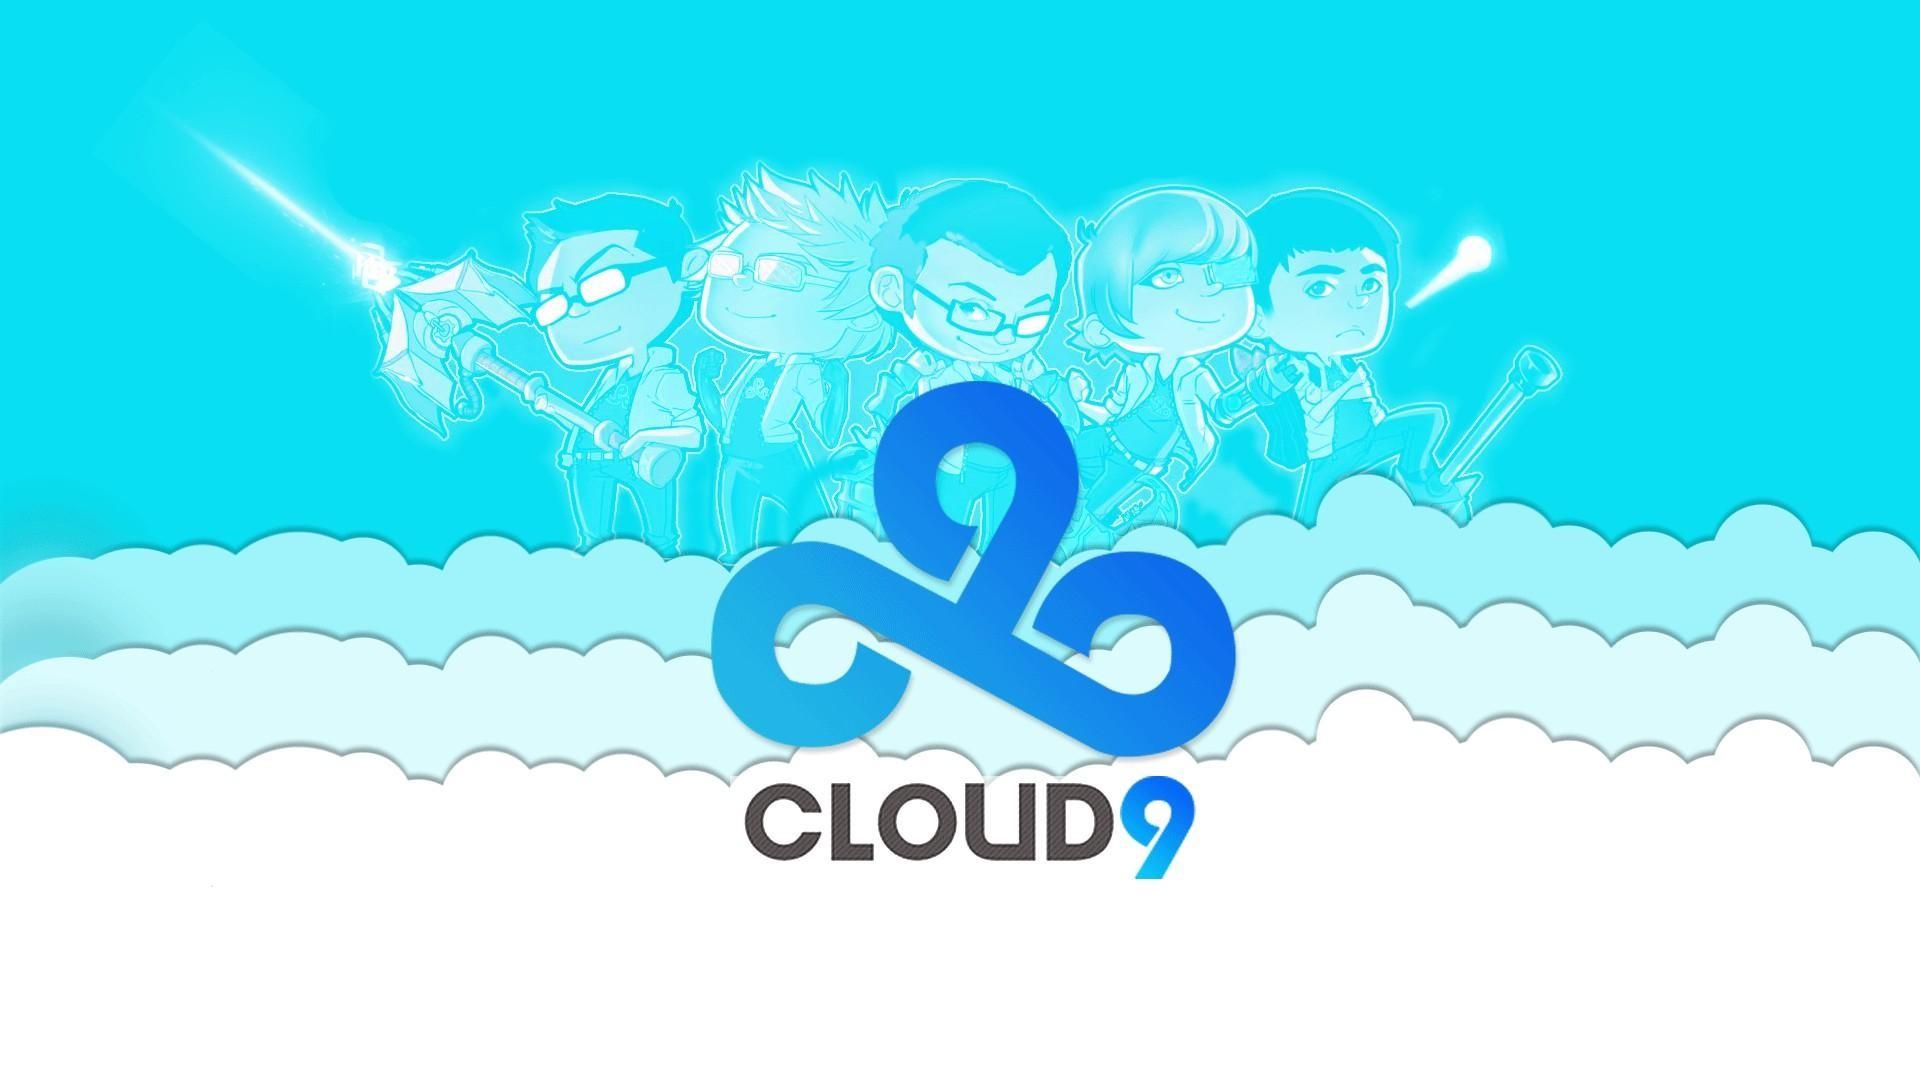 Cloud 9 lcs league of legends championship meteos wallpaper   (62161)